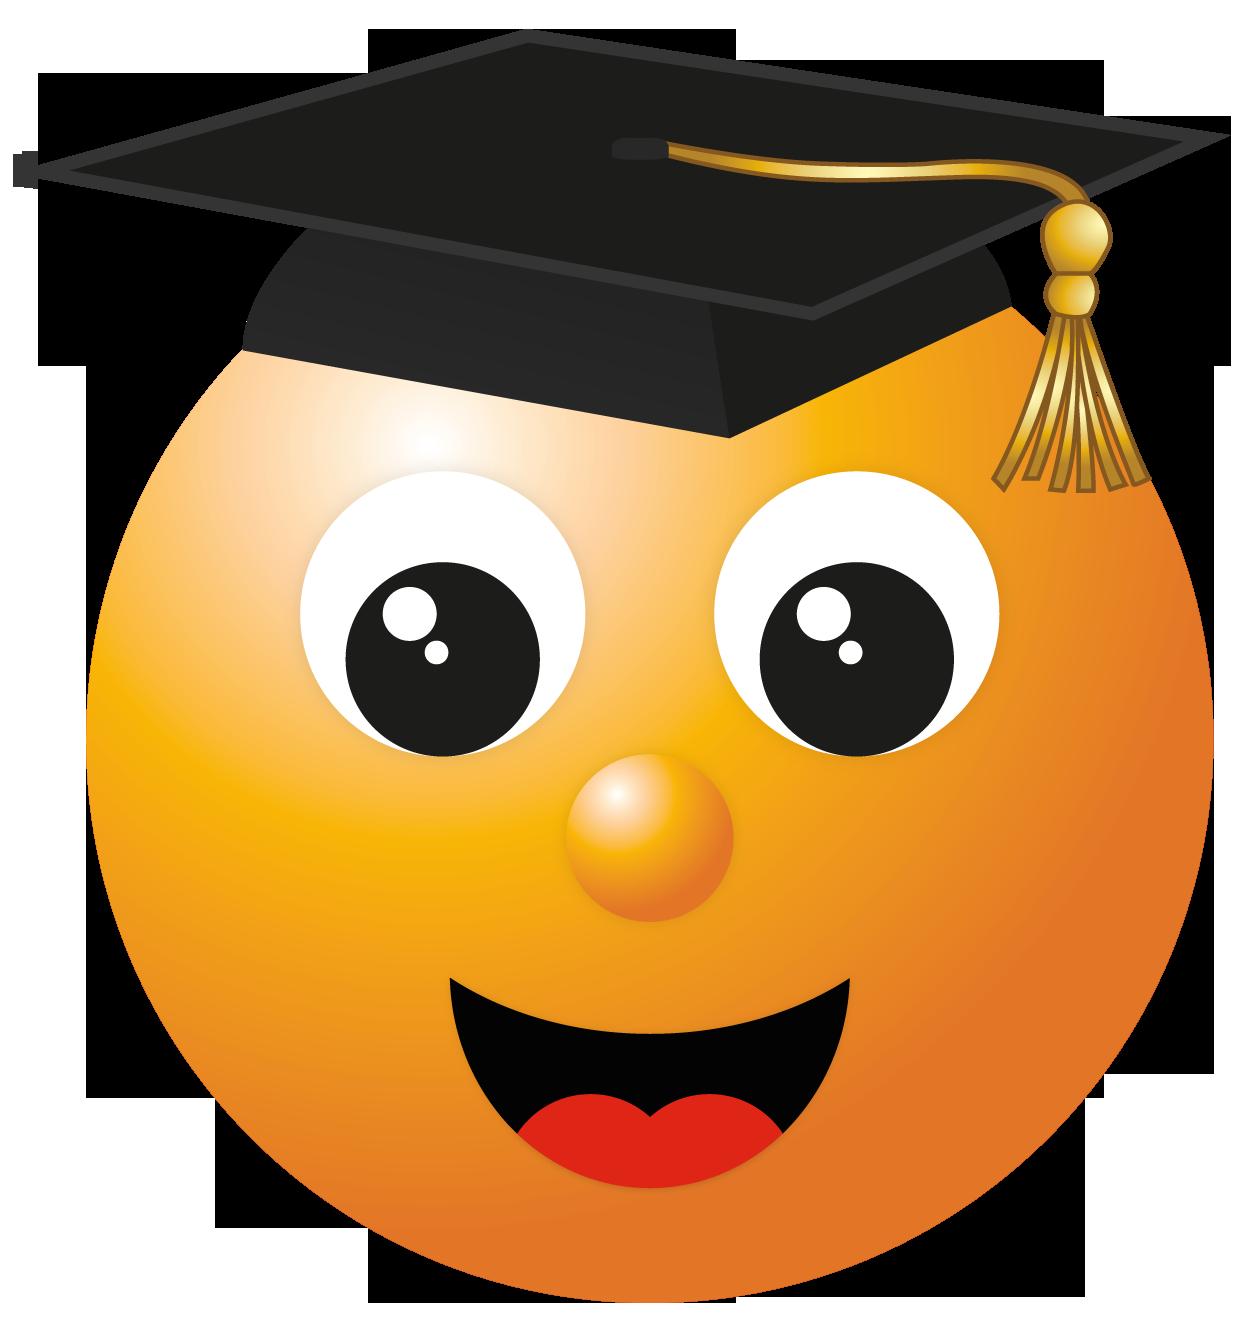 Caritas Smiley Emoji Smiley Cute Emoji